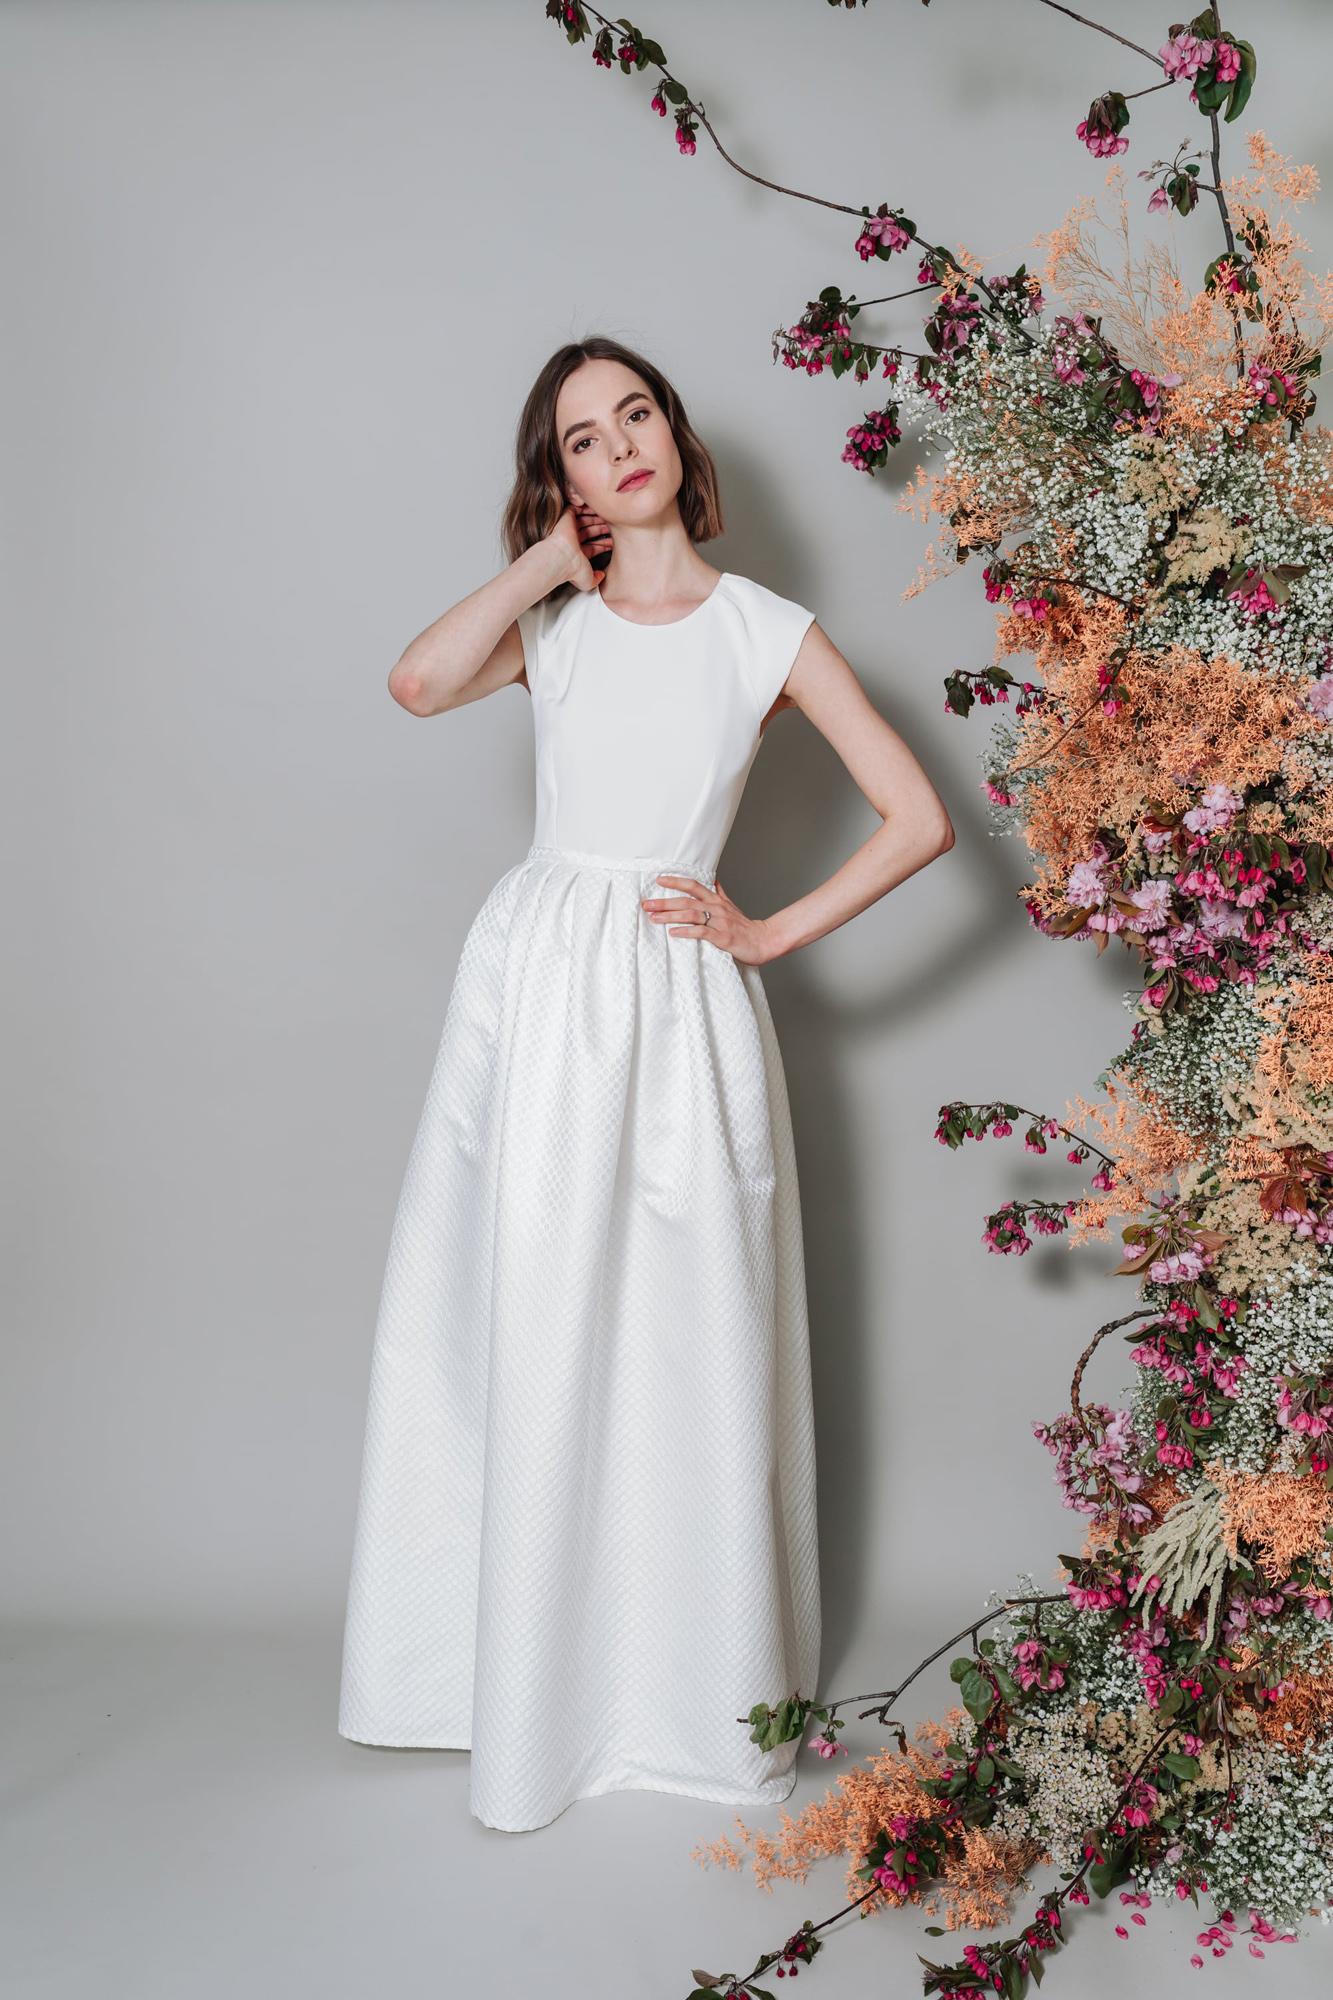 Kate-Beaumont-Sheffield-Zinnia-Modern-Wedding-Gown-Polka-Dot-Pleated-Skirt-2.jpg